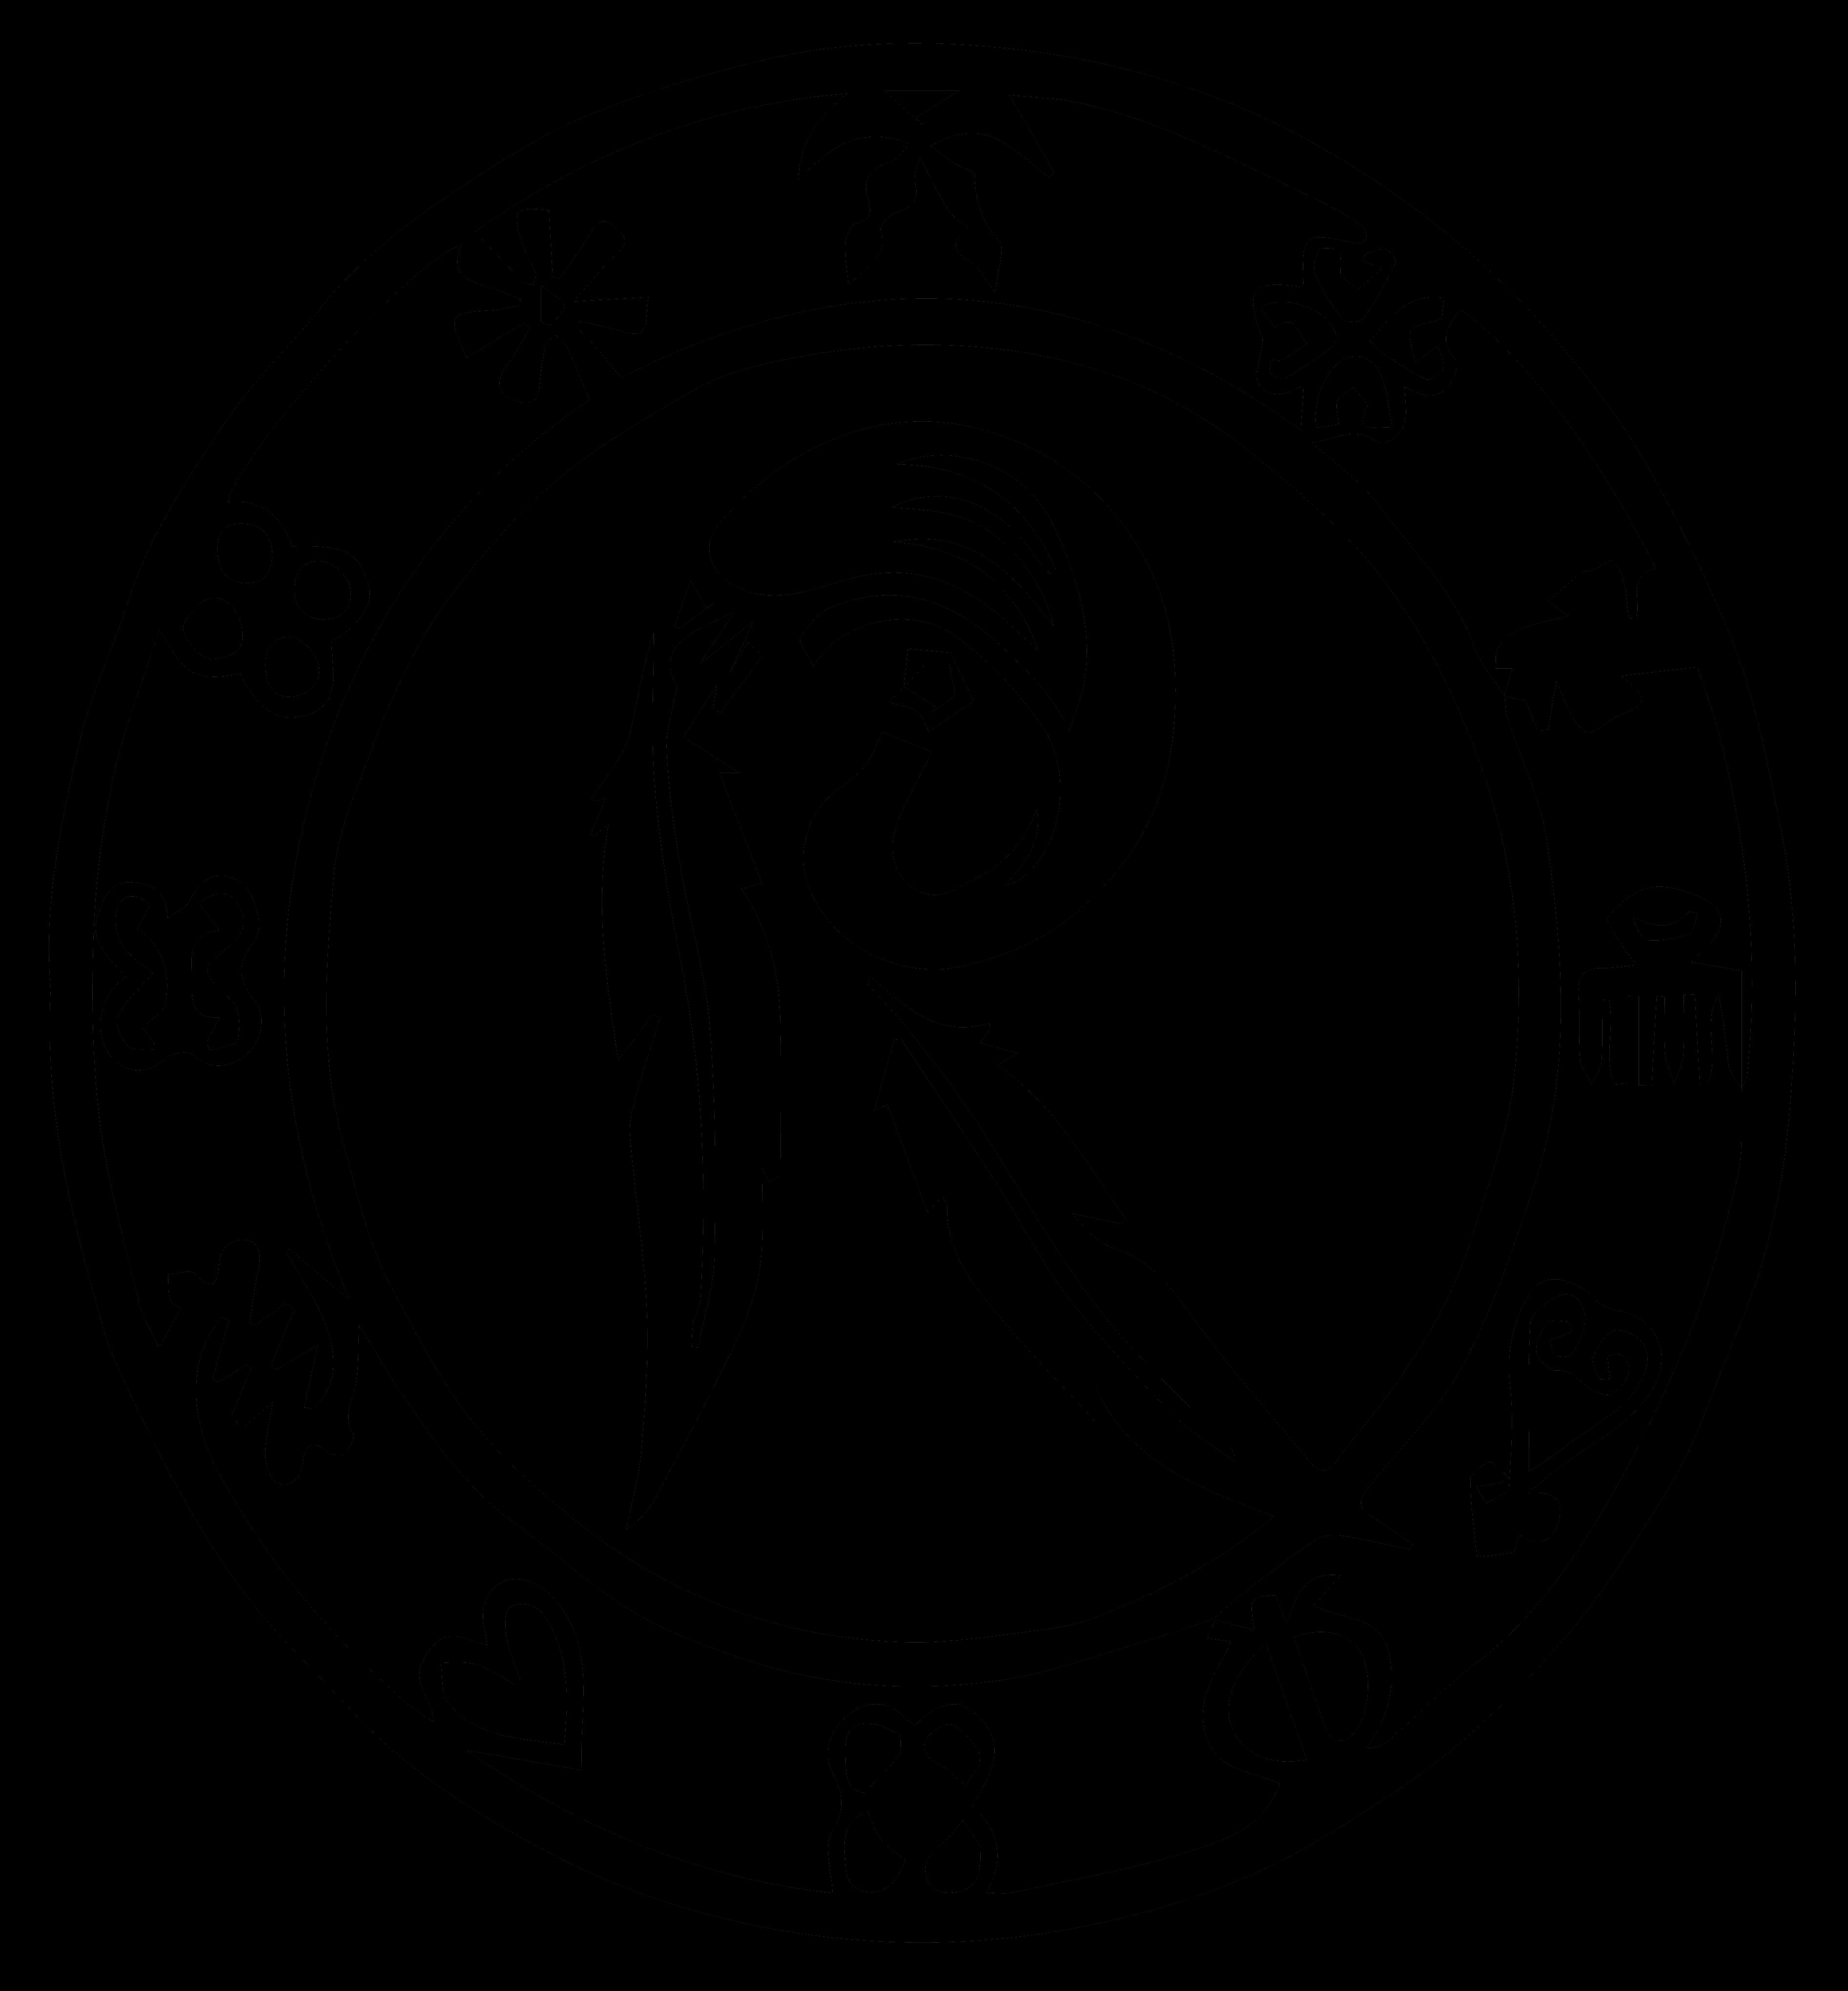 VOLTA REVIVAL FOUNDATION